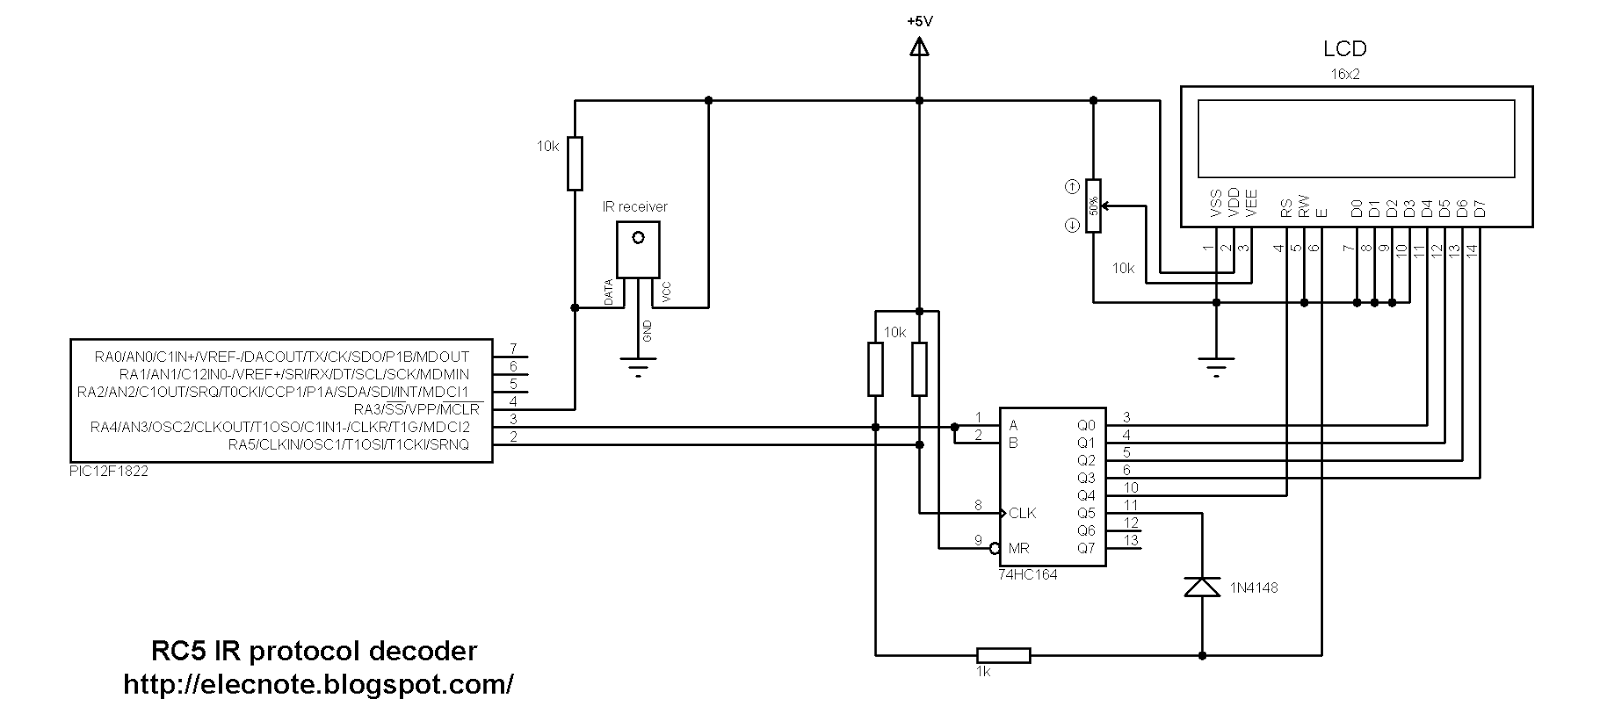 electronics note  rc5 ir remote control protocol decoder